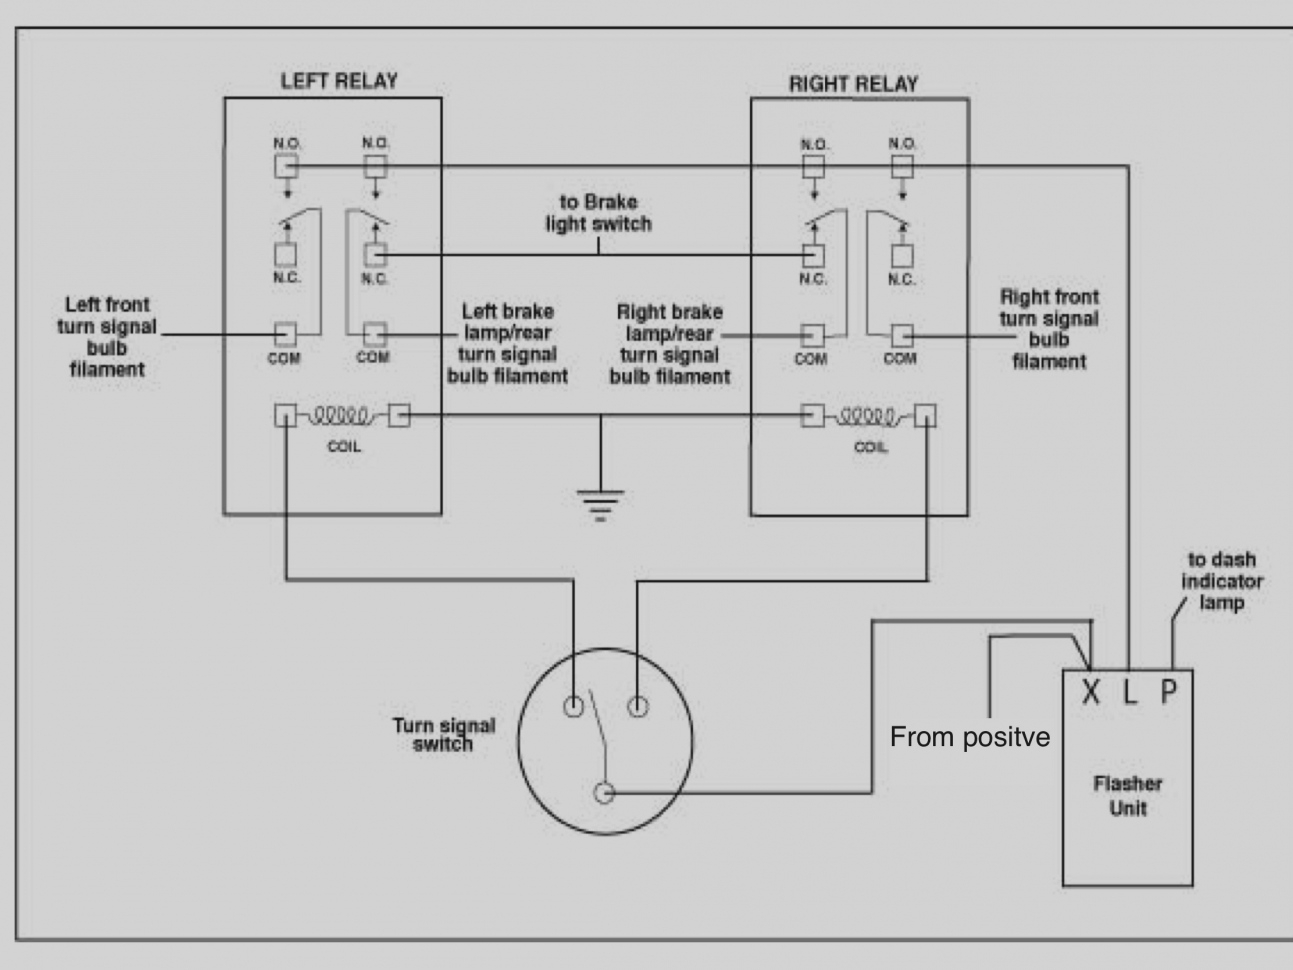 wiring diagram for polaris ranger 800 xp 11 1 kenmo lp de \u2022